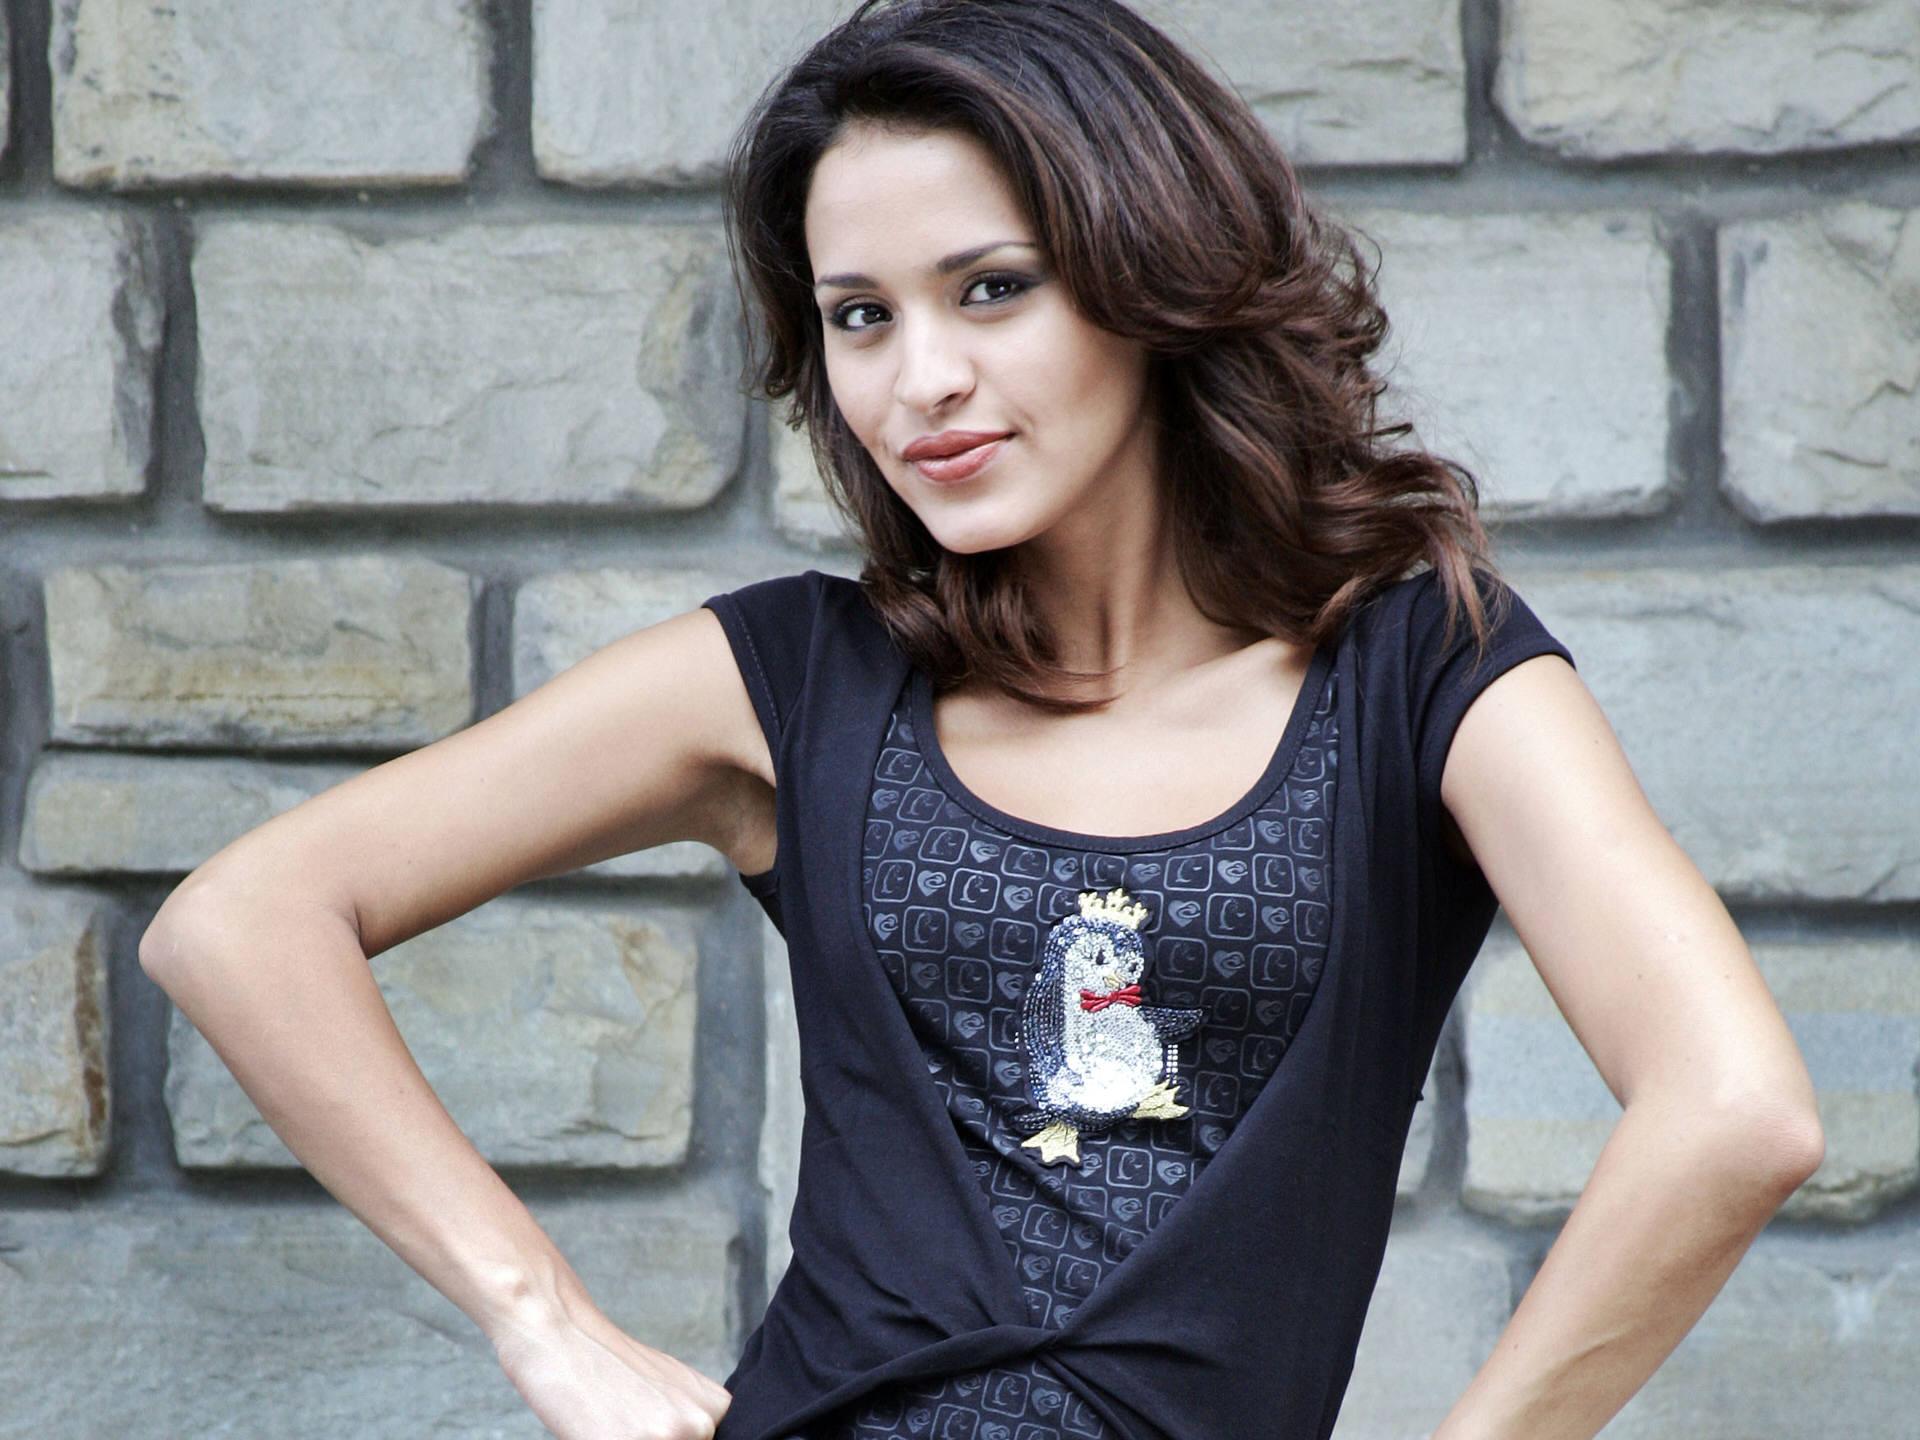 Amazing Leila Ben Khalifa Pictures & Backgrounds